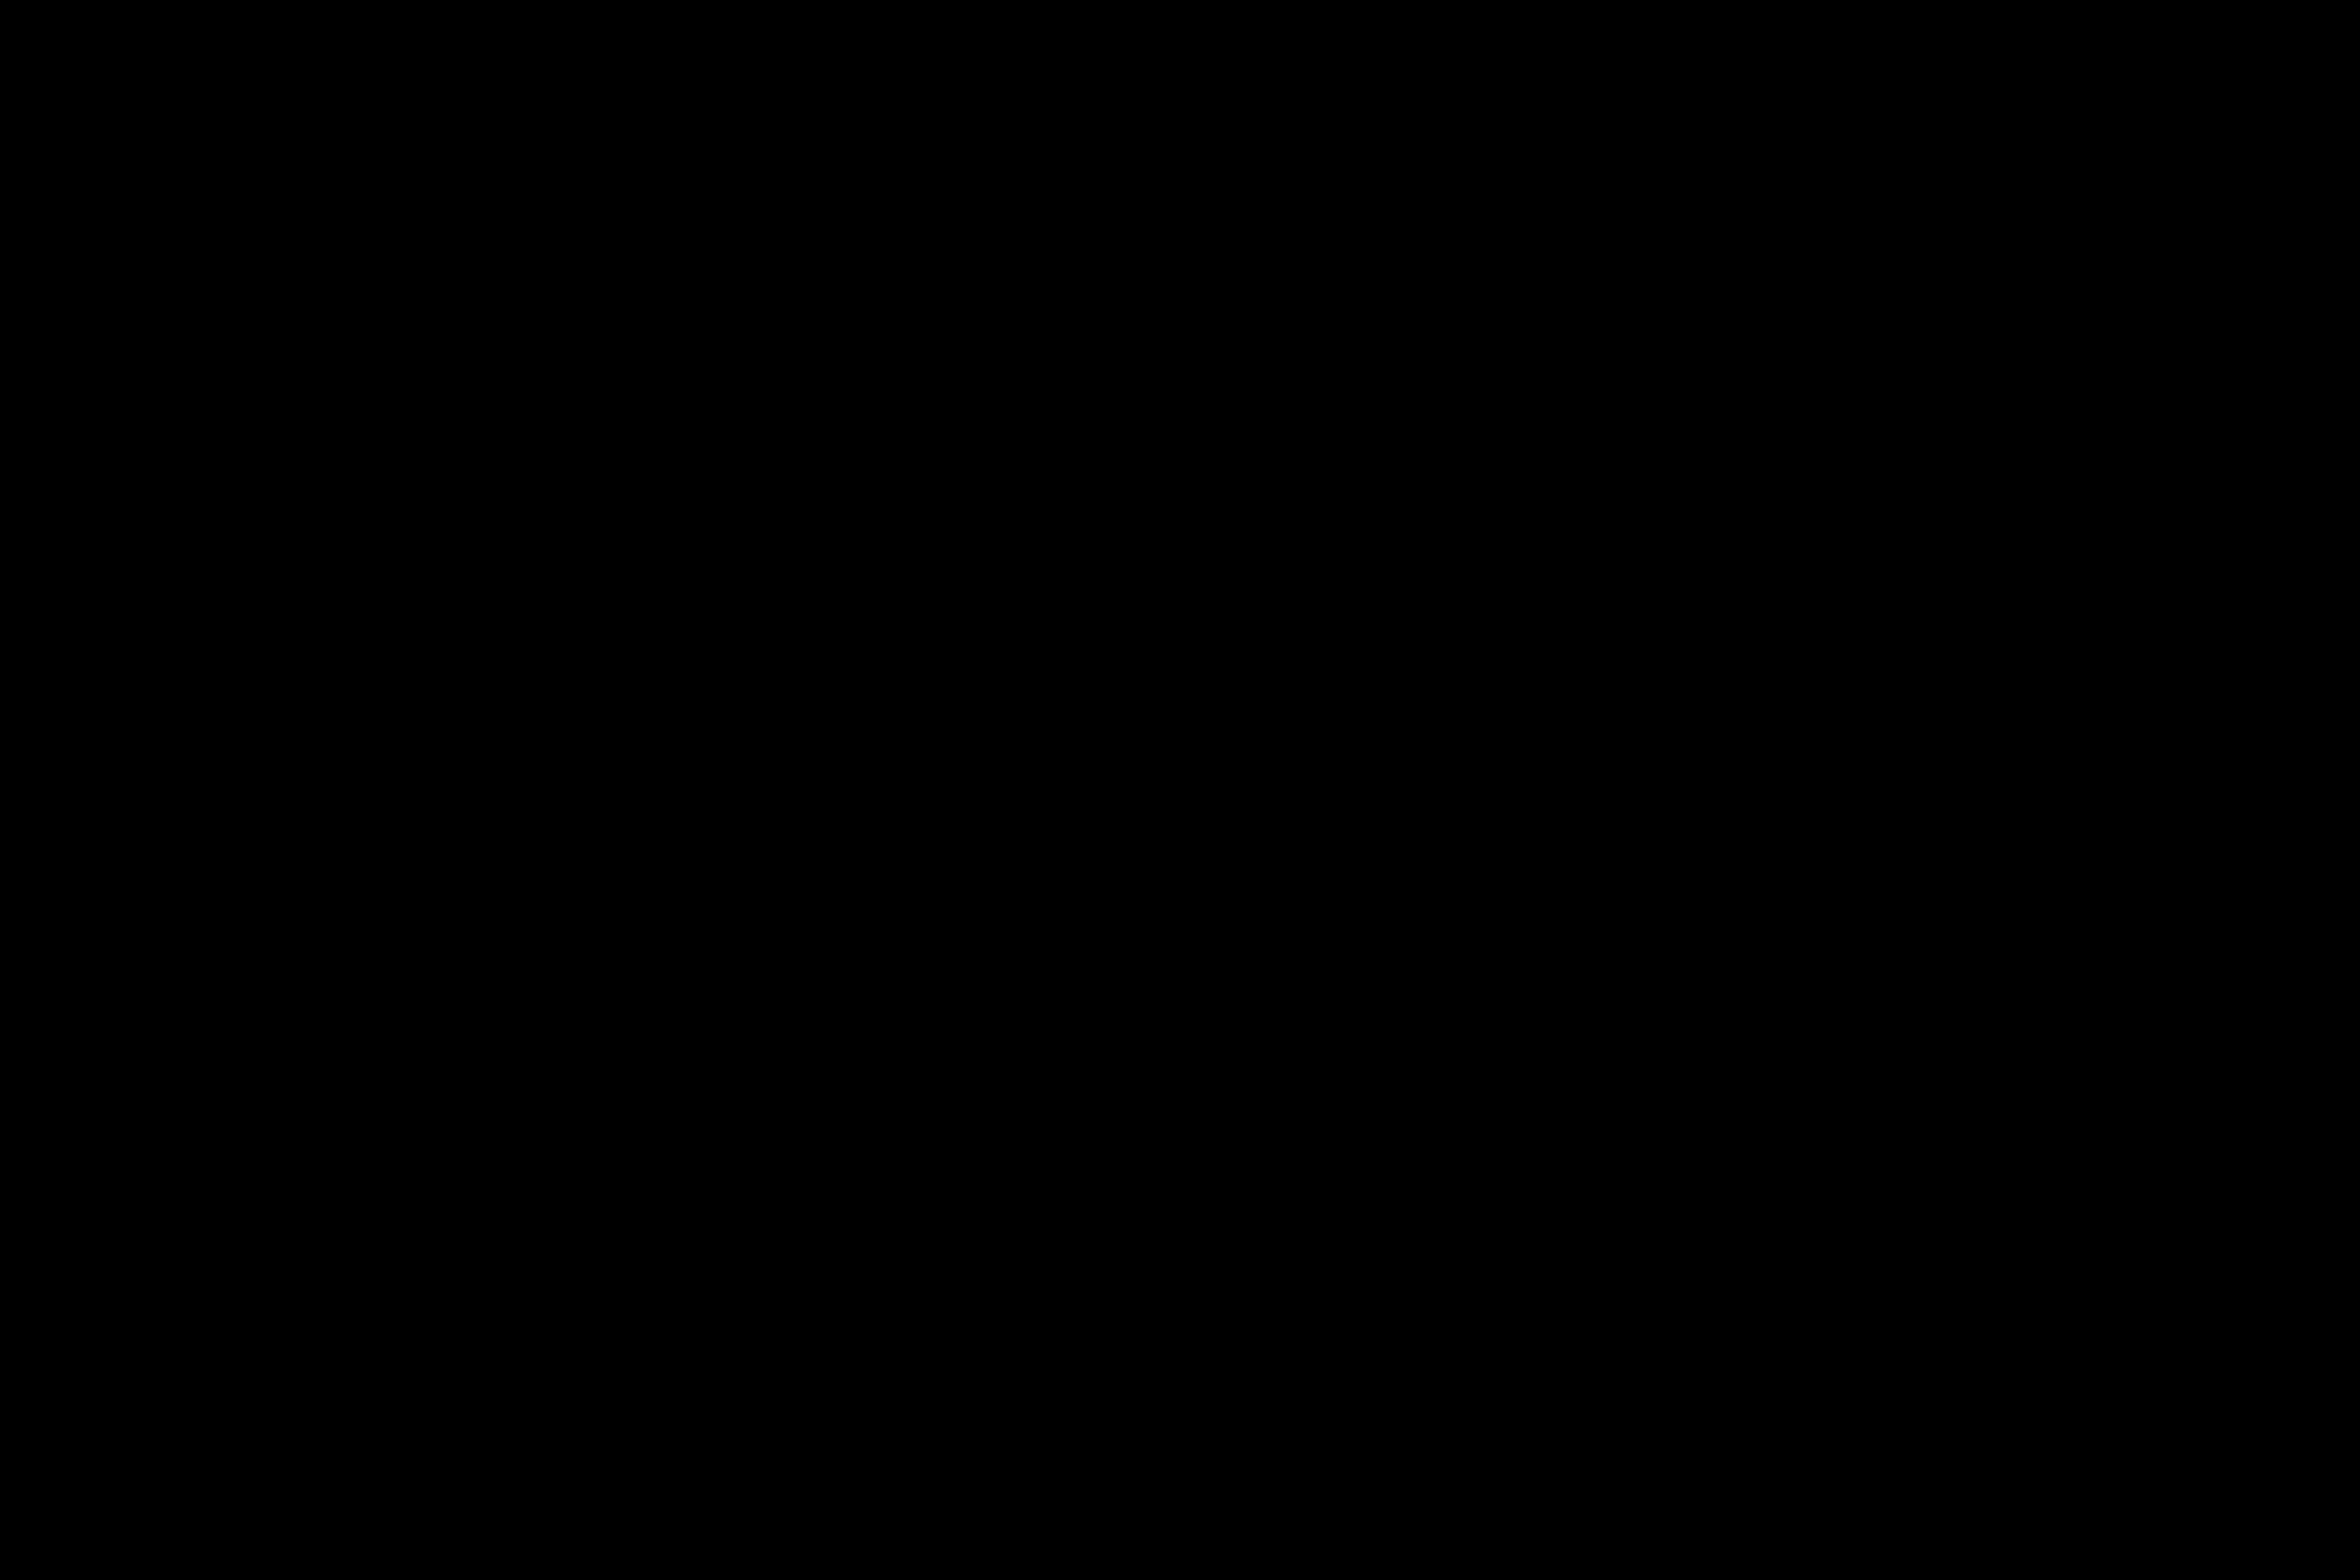 L2460663.jpg